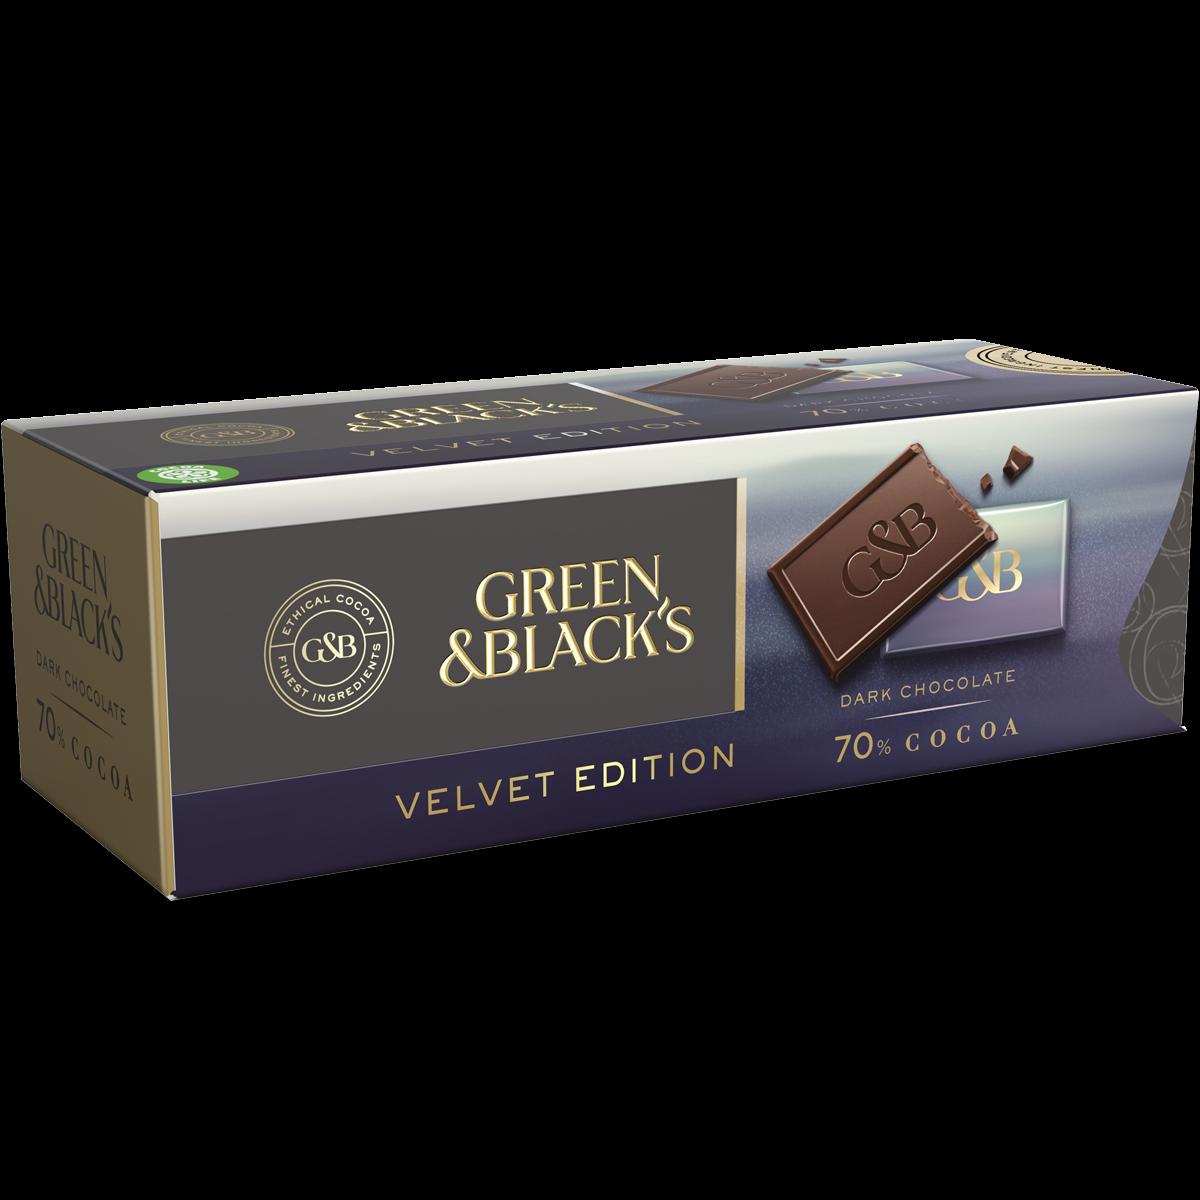 Green & Black's Dark Chocolate 70% Prism Box (Box of 9)